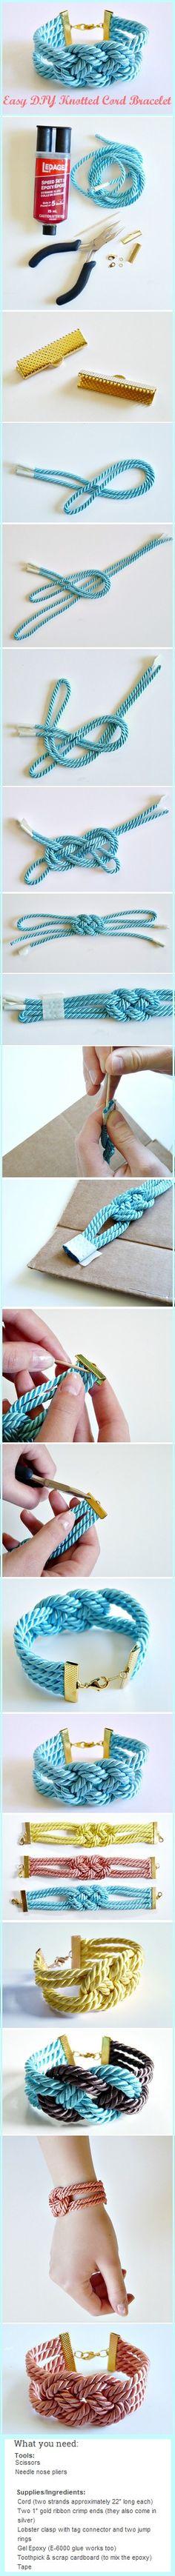 Easy DIY Knotted Cord Bracelet  http://dans-le-townhouse.blogspot.ca/2013/05/easy-diy-knotted-cord-bracelet.html